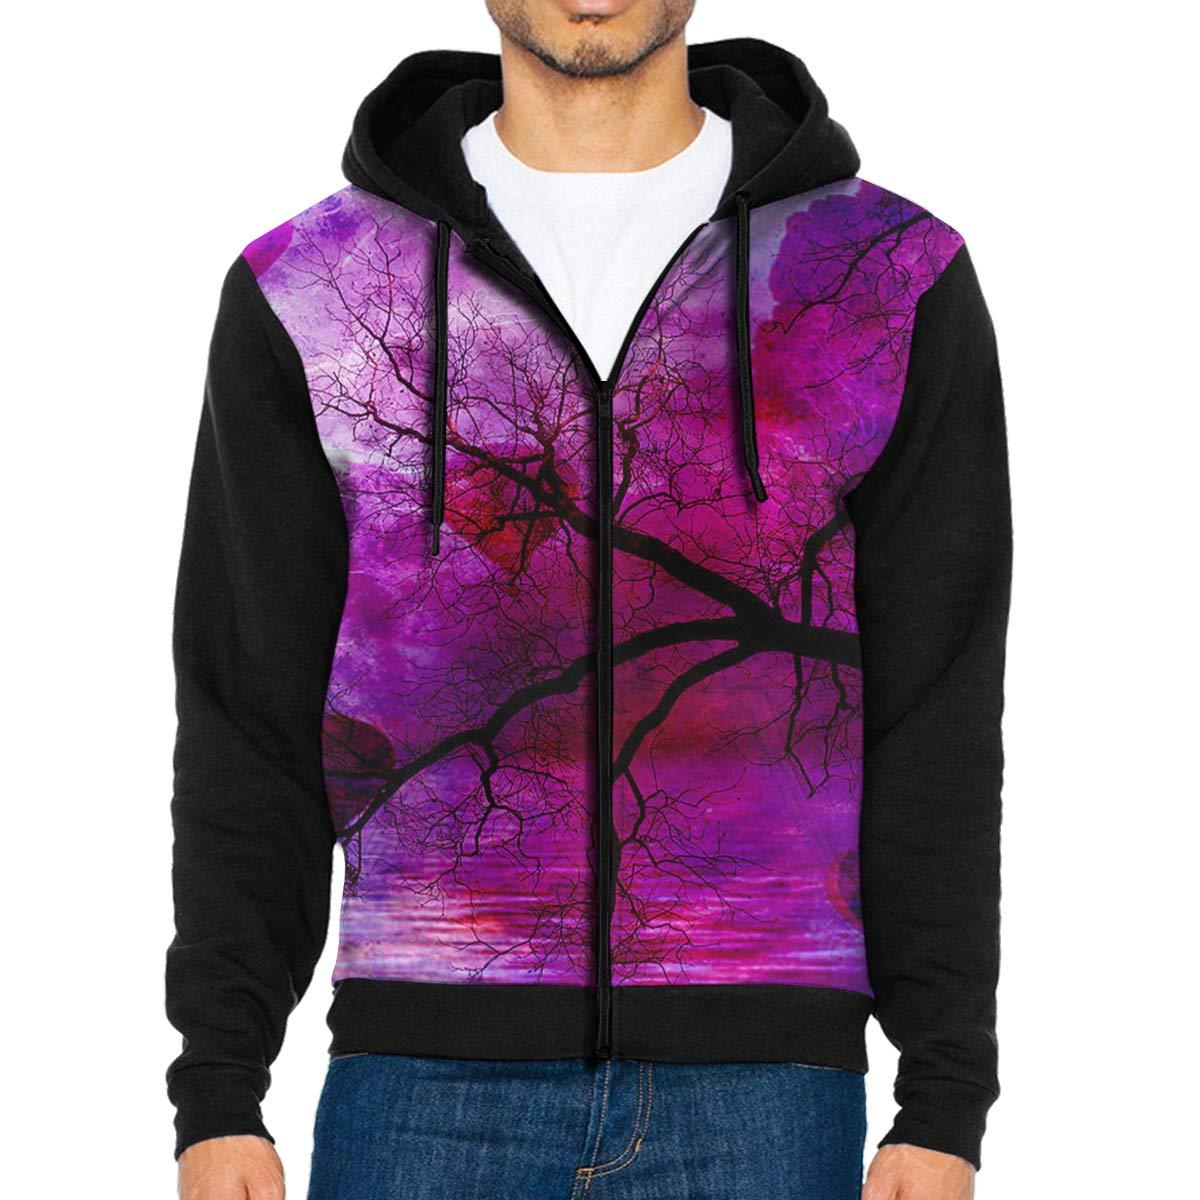 HEHE TAN Mens Pullover Hood Fantasy Purple Pink Trees Zip Hoodies Hooded Popular Jackets Coats